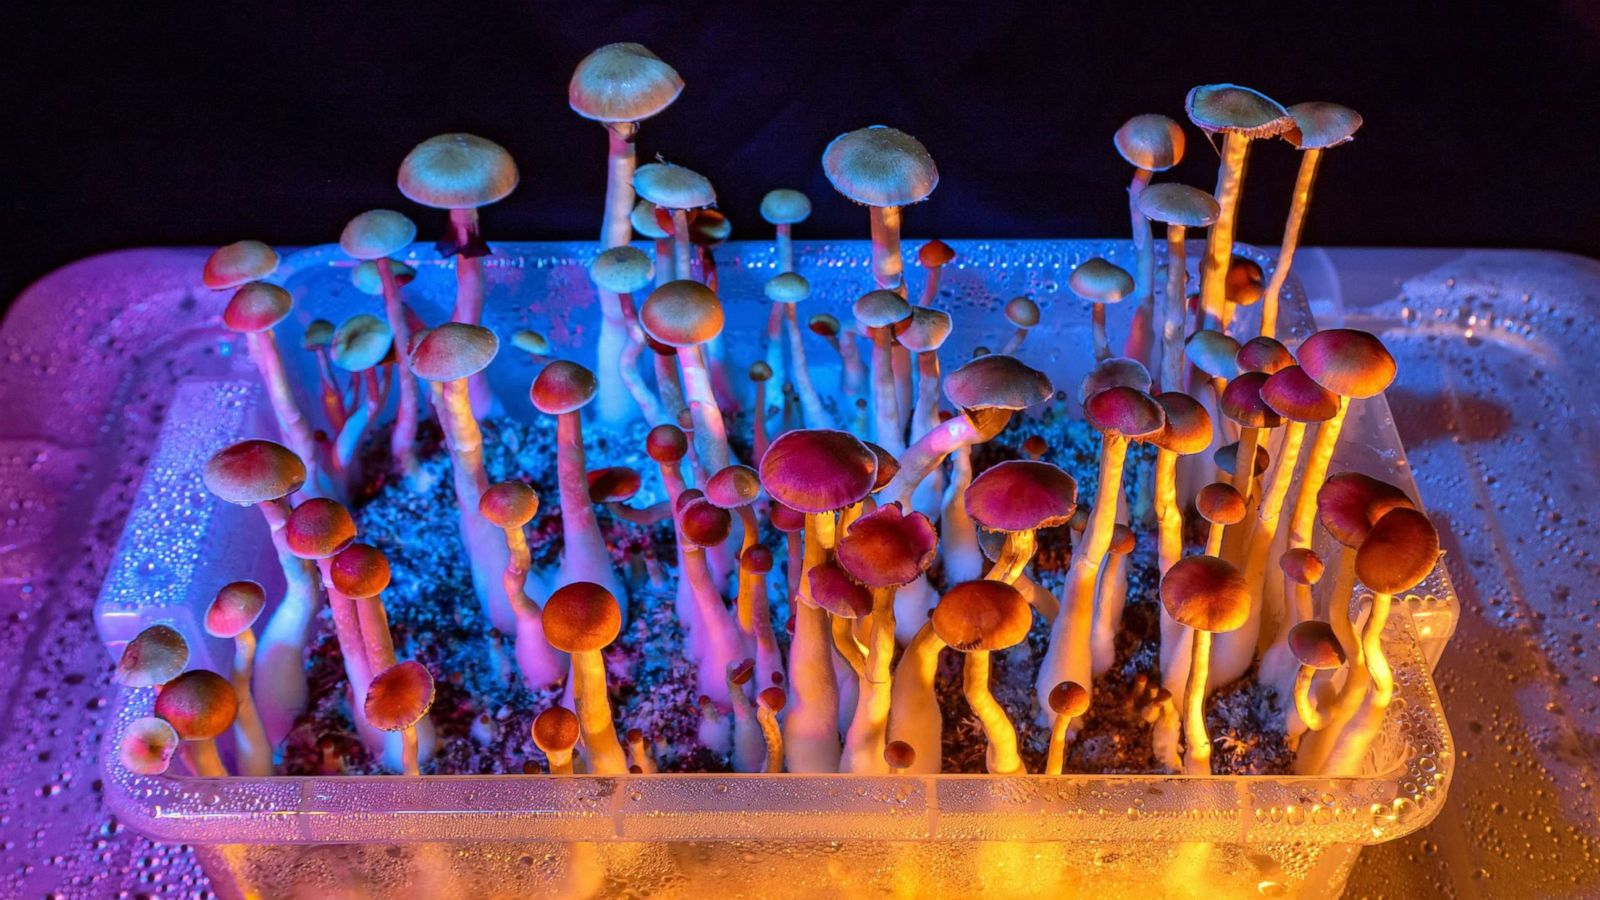 Santa Cruz decriminalizes psychedelic mushrooms - ABC News